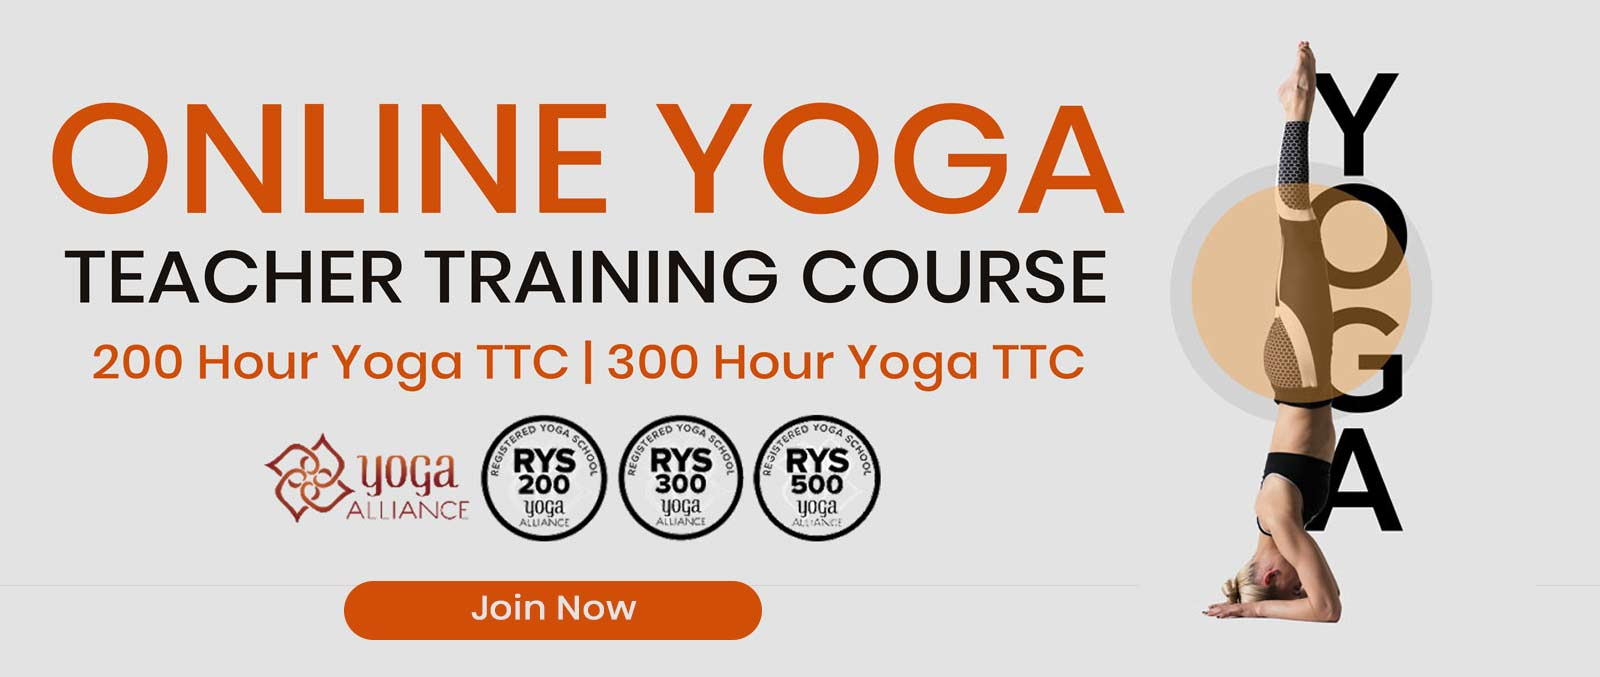 online-yoga-teacher-training-course-banner